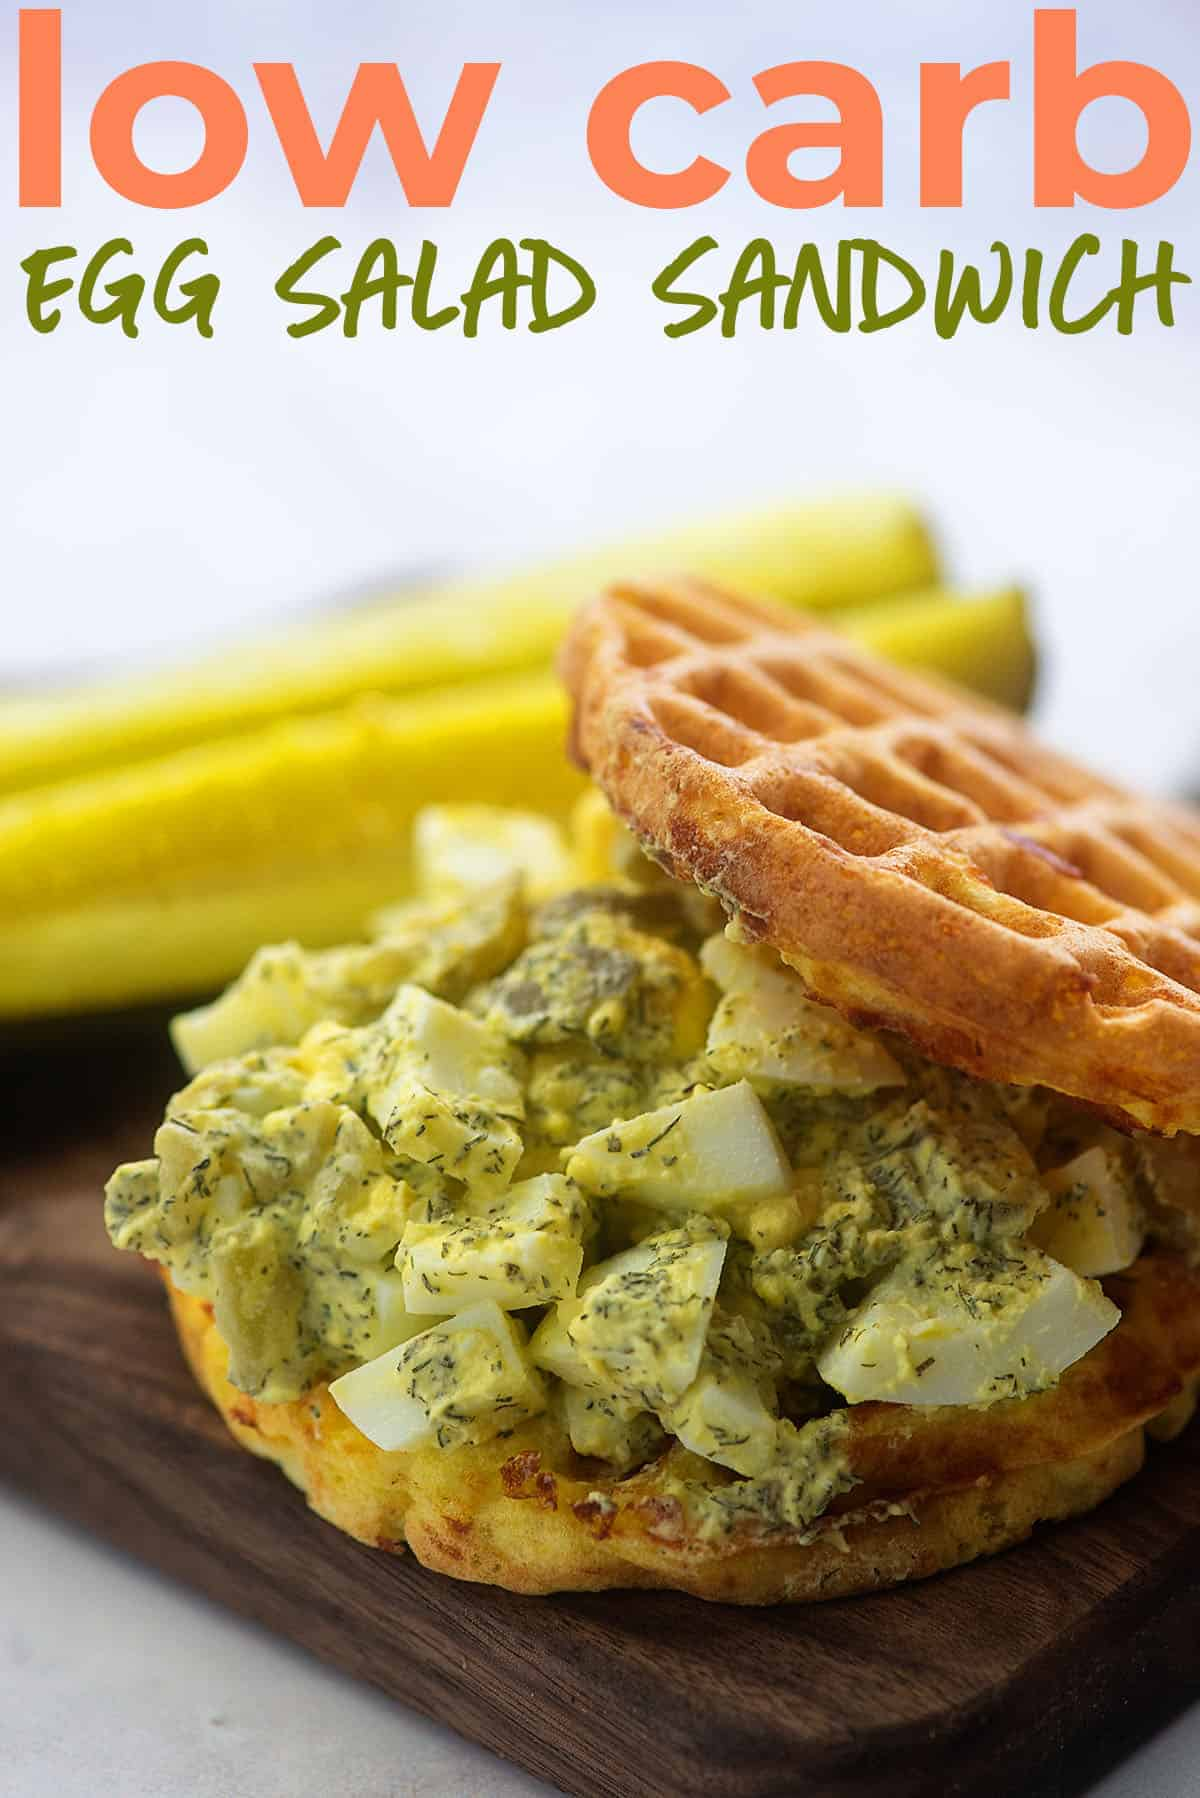 low carb egg salad sandwich on chaffle buns